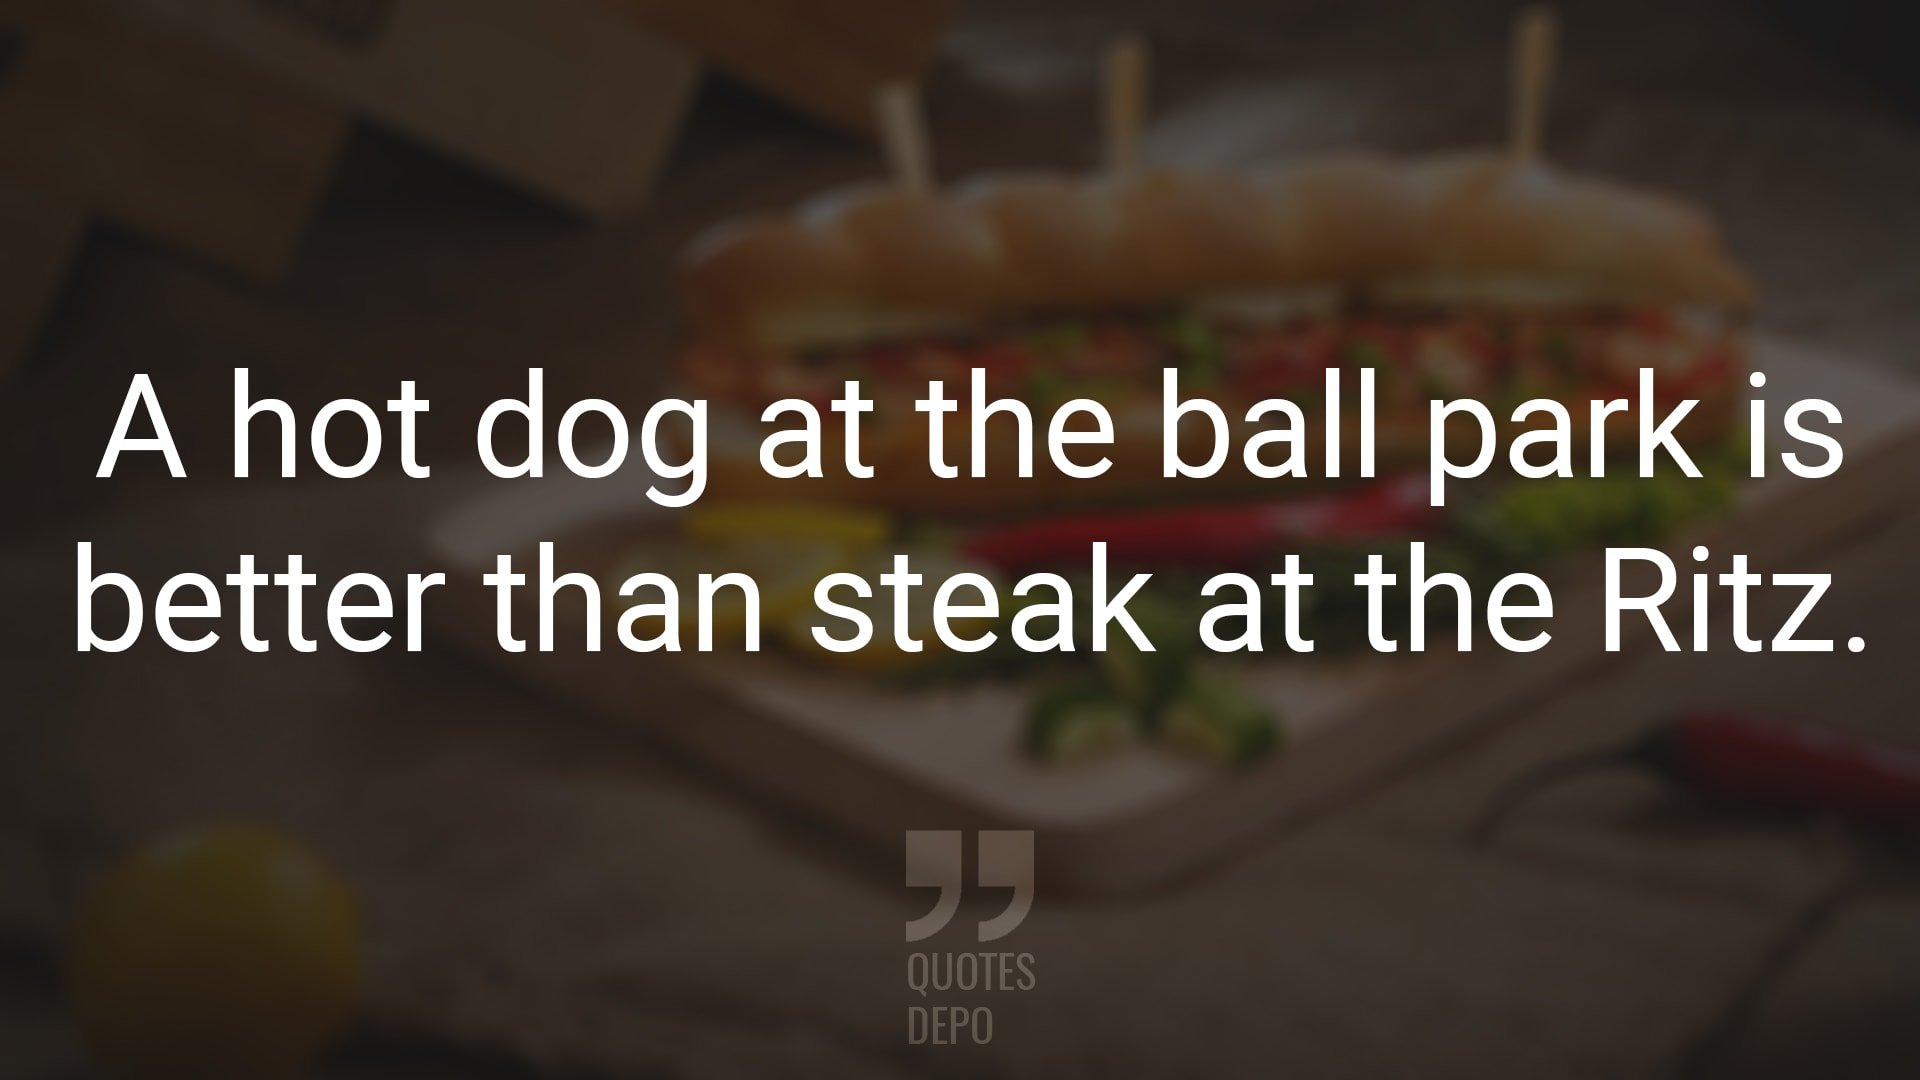 a hot dog at the ball park